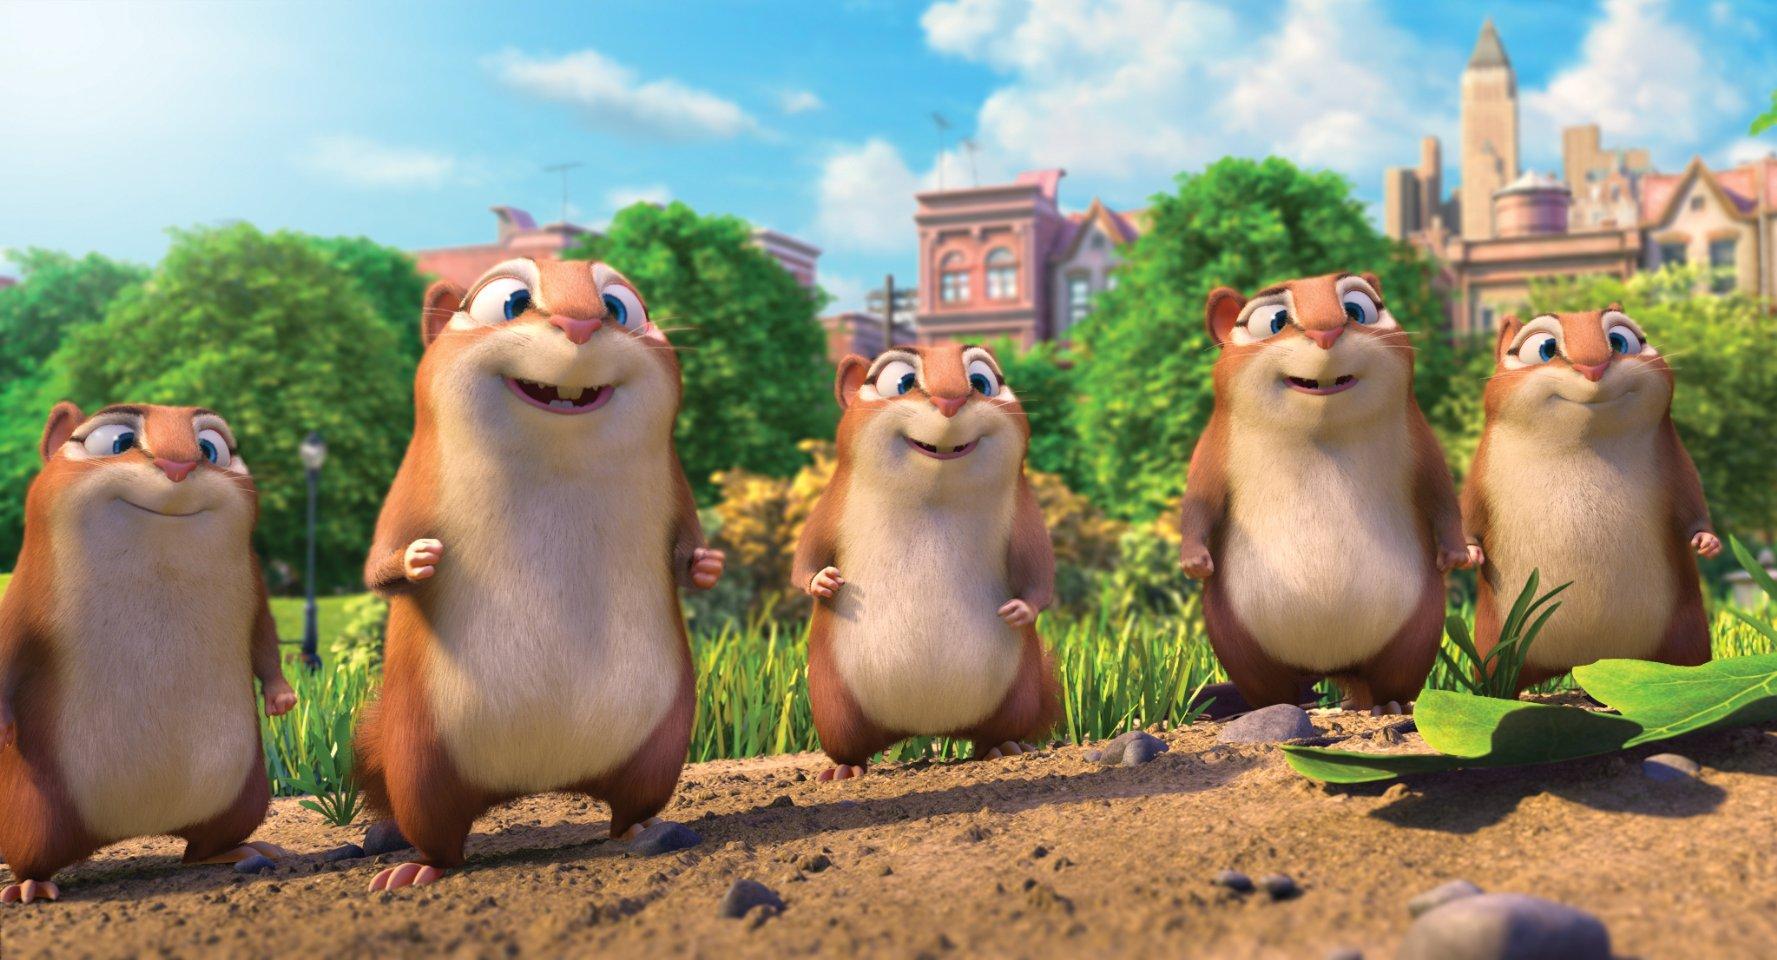 Реальная белка 2 / The Nut Job 2: Nutty by Nature (2017) HDRIP скачать торрент с rutor org